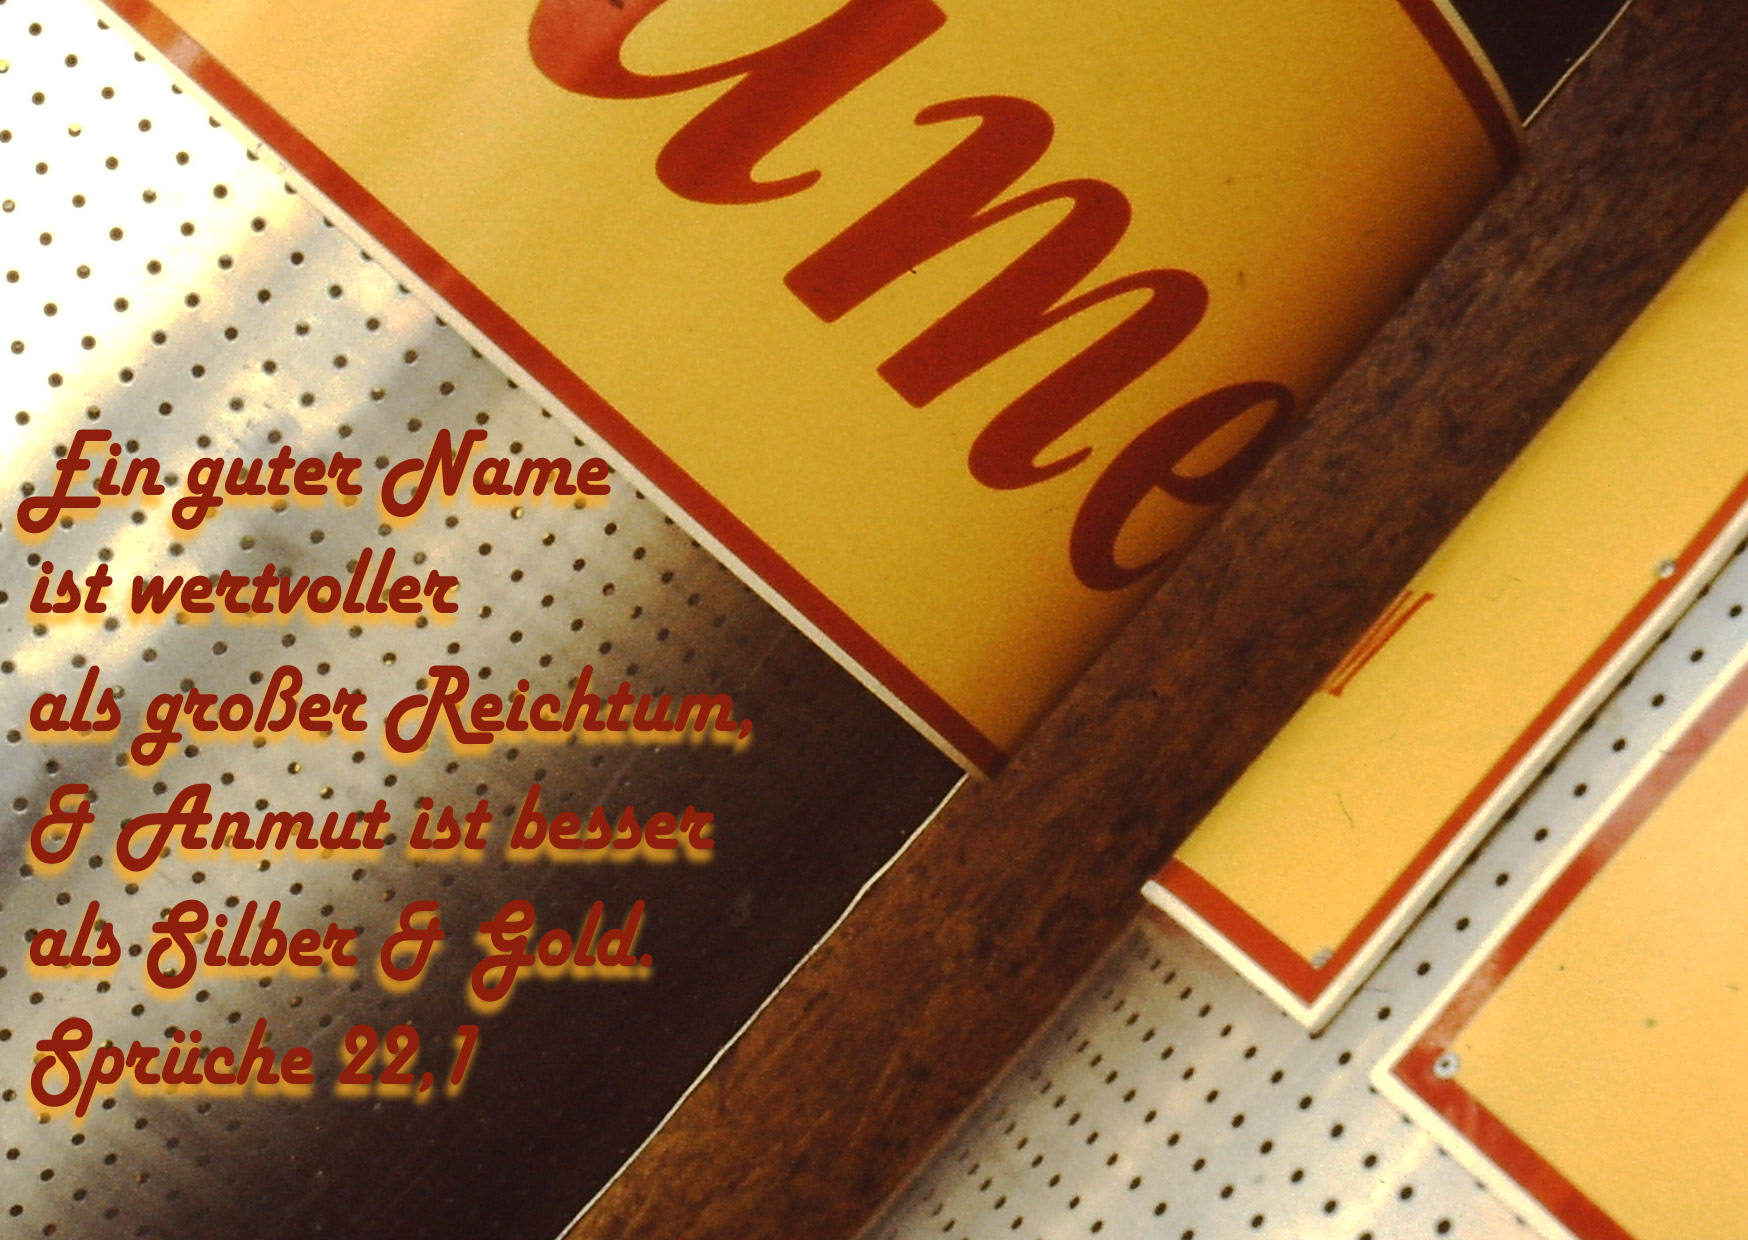 Bibelzitat, Sprüche, Name, Foto: Danzer, Walter, go 4 Jesus, Bibel